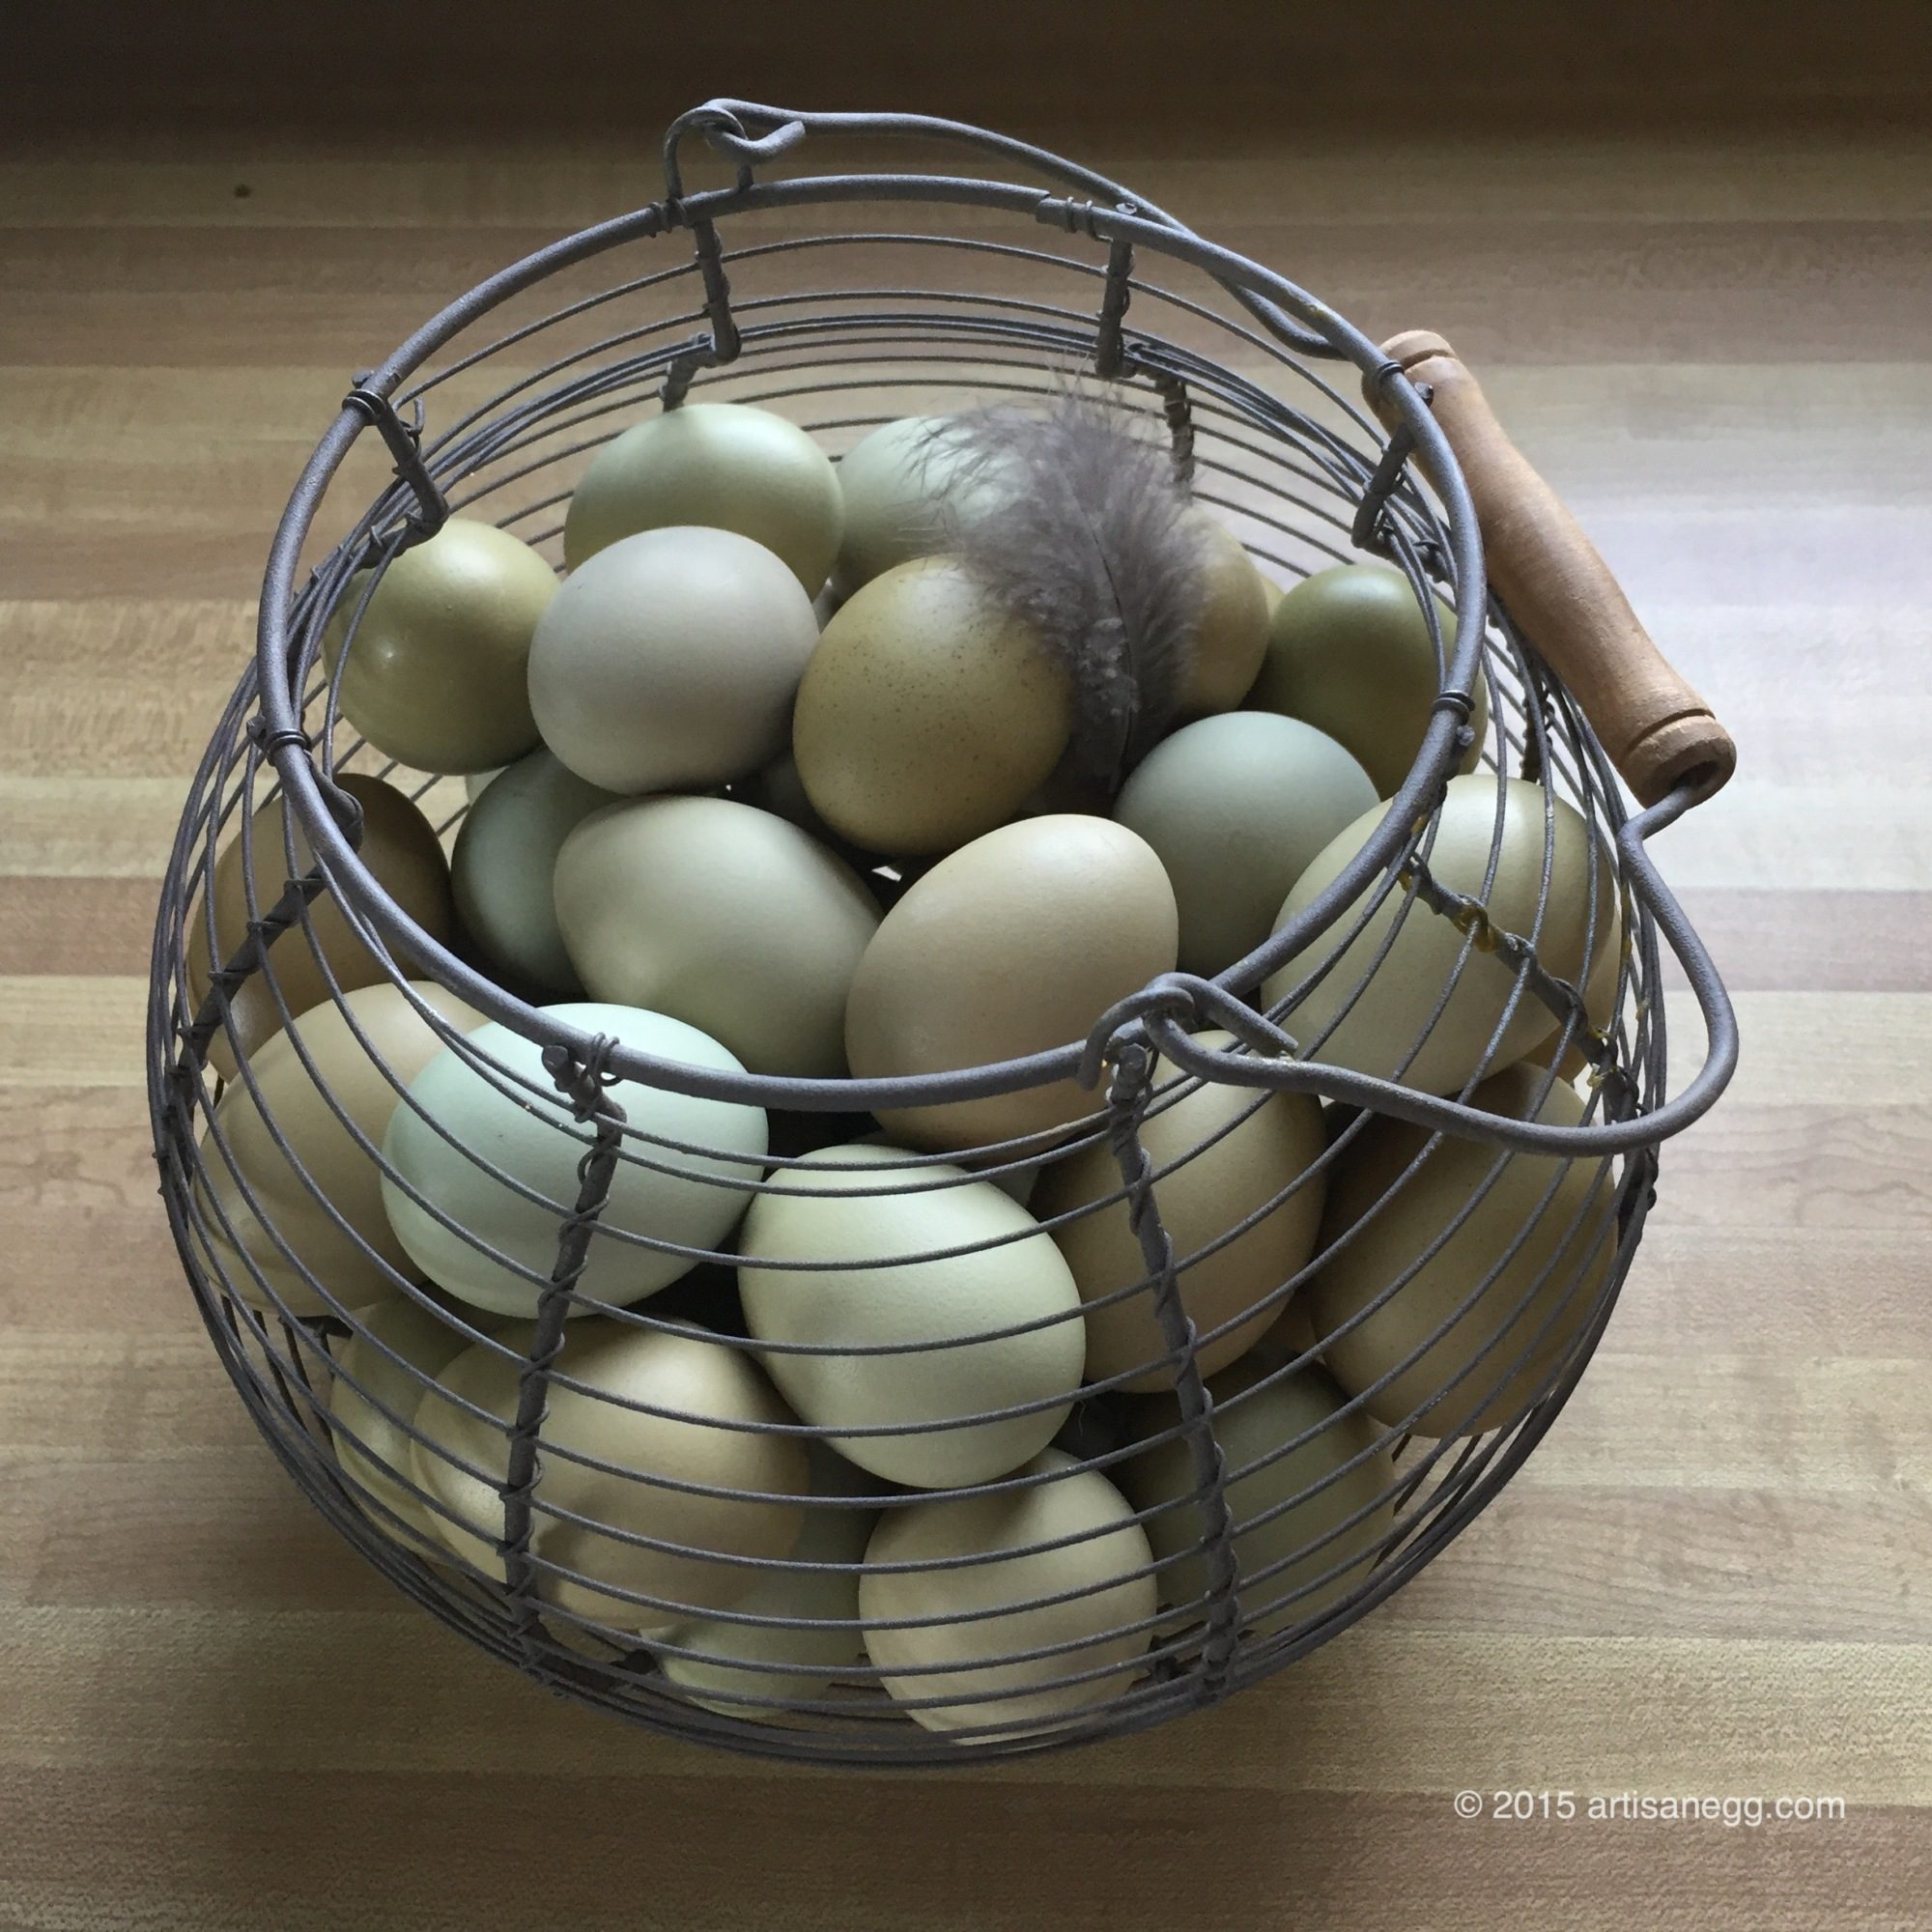 My Girl's Eggs